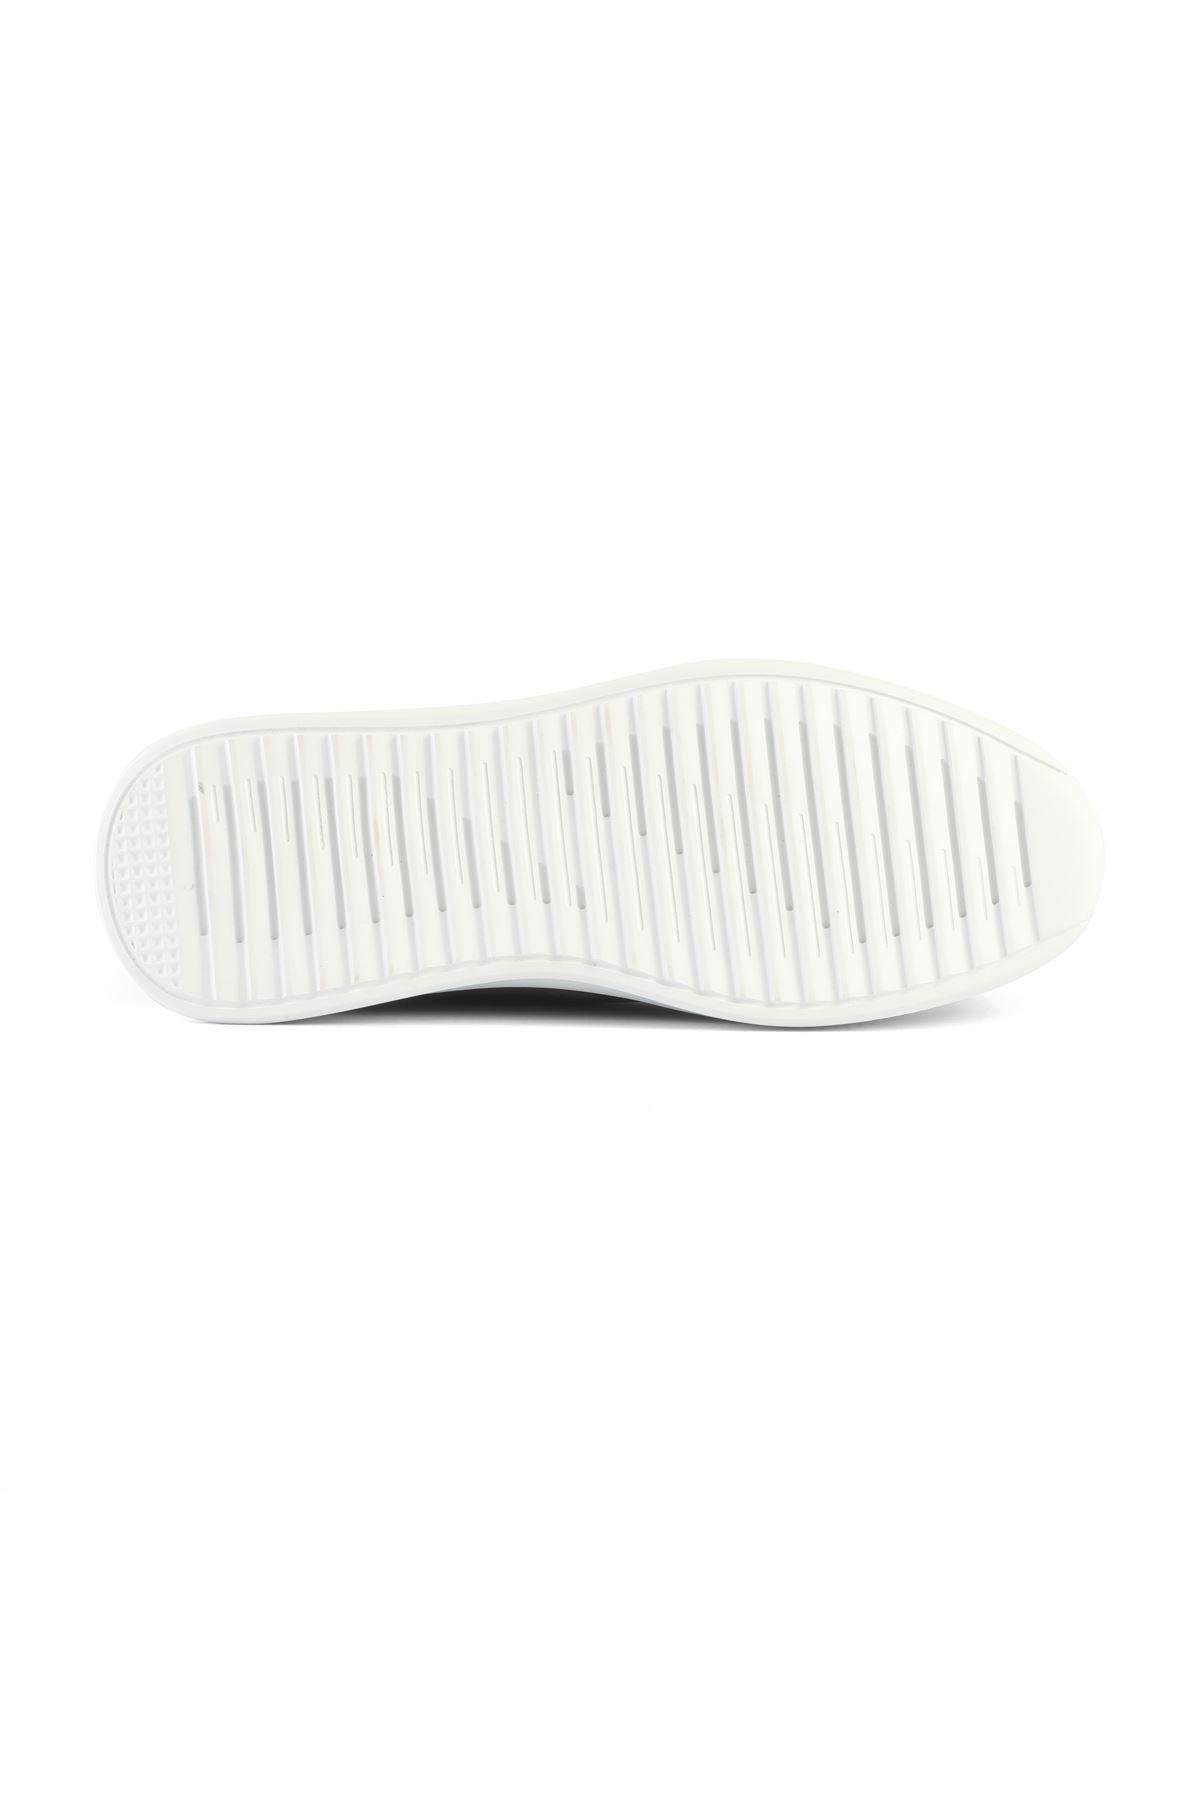 Libero L3438 Gray Casual Shoes